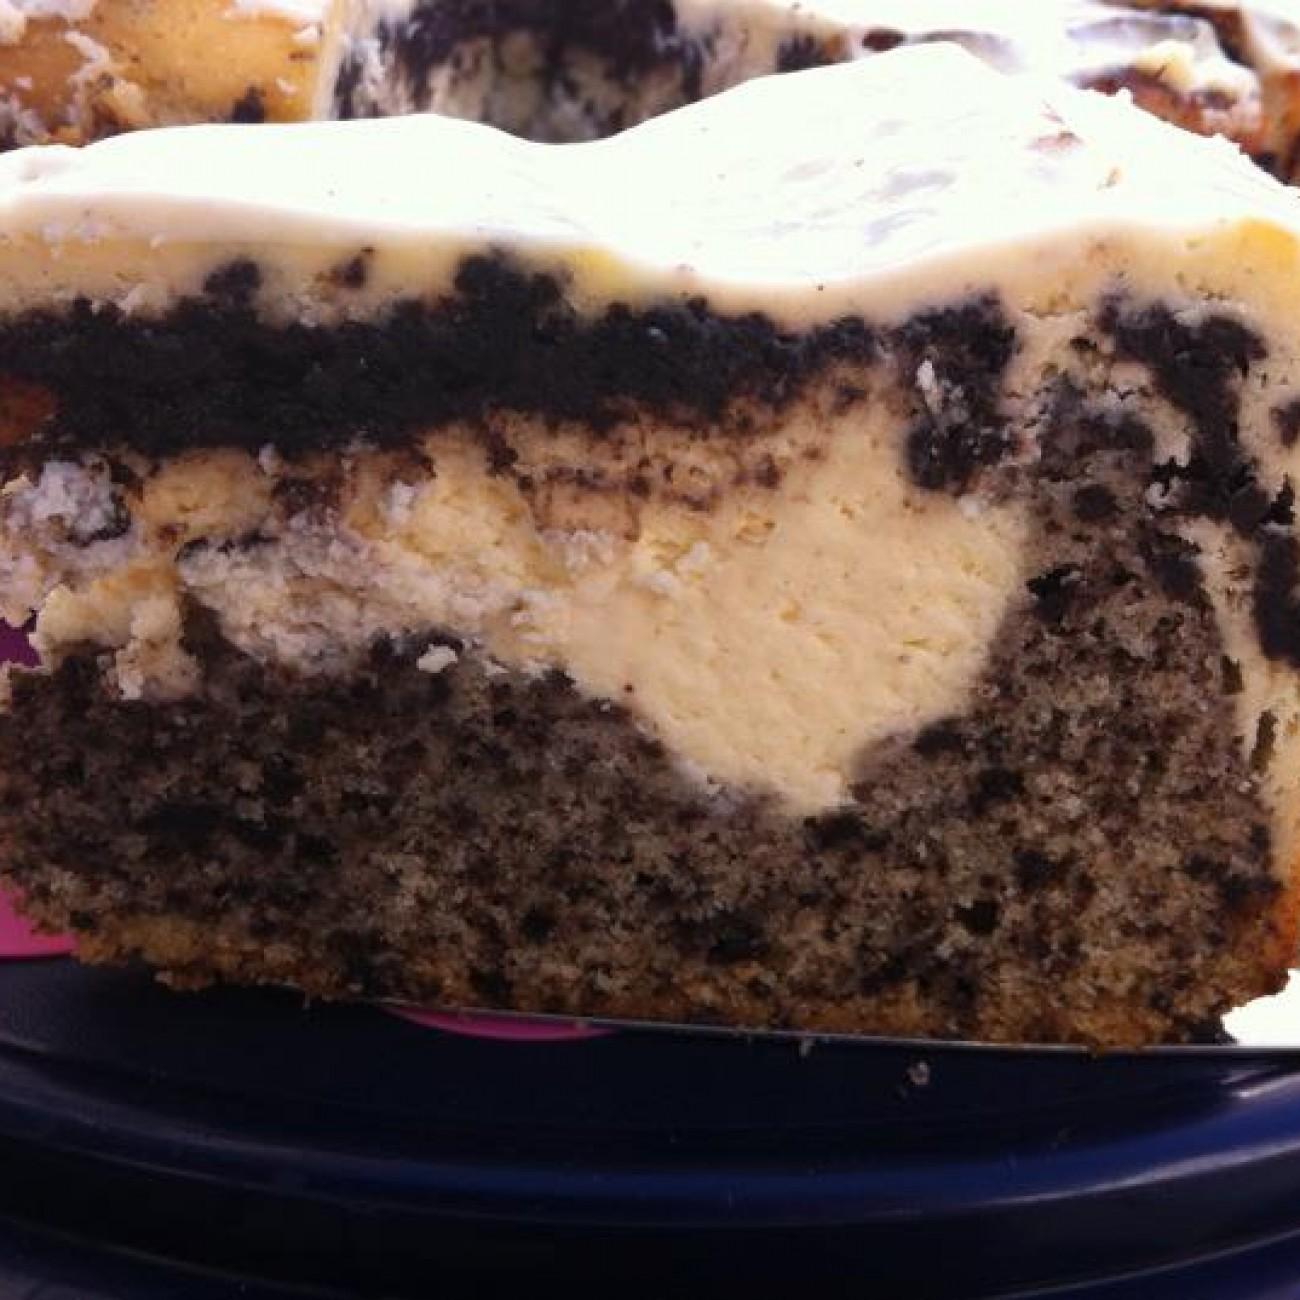 Oreocookie Cheesecake